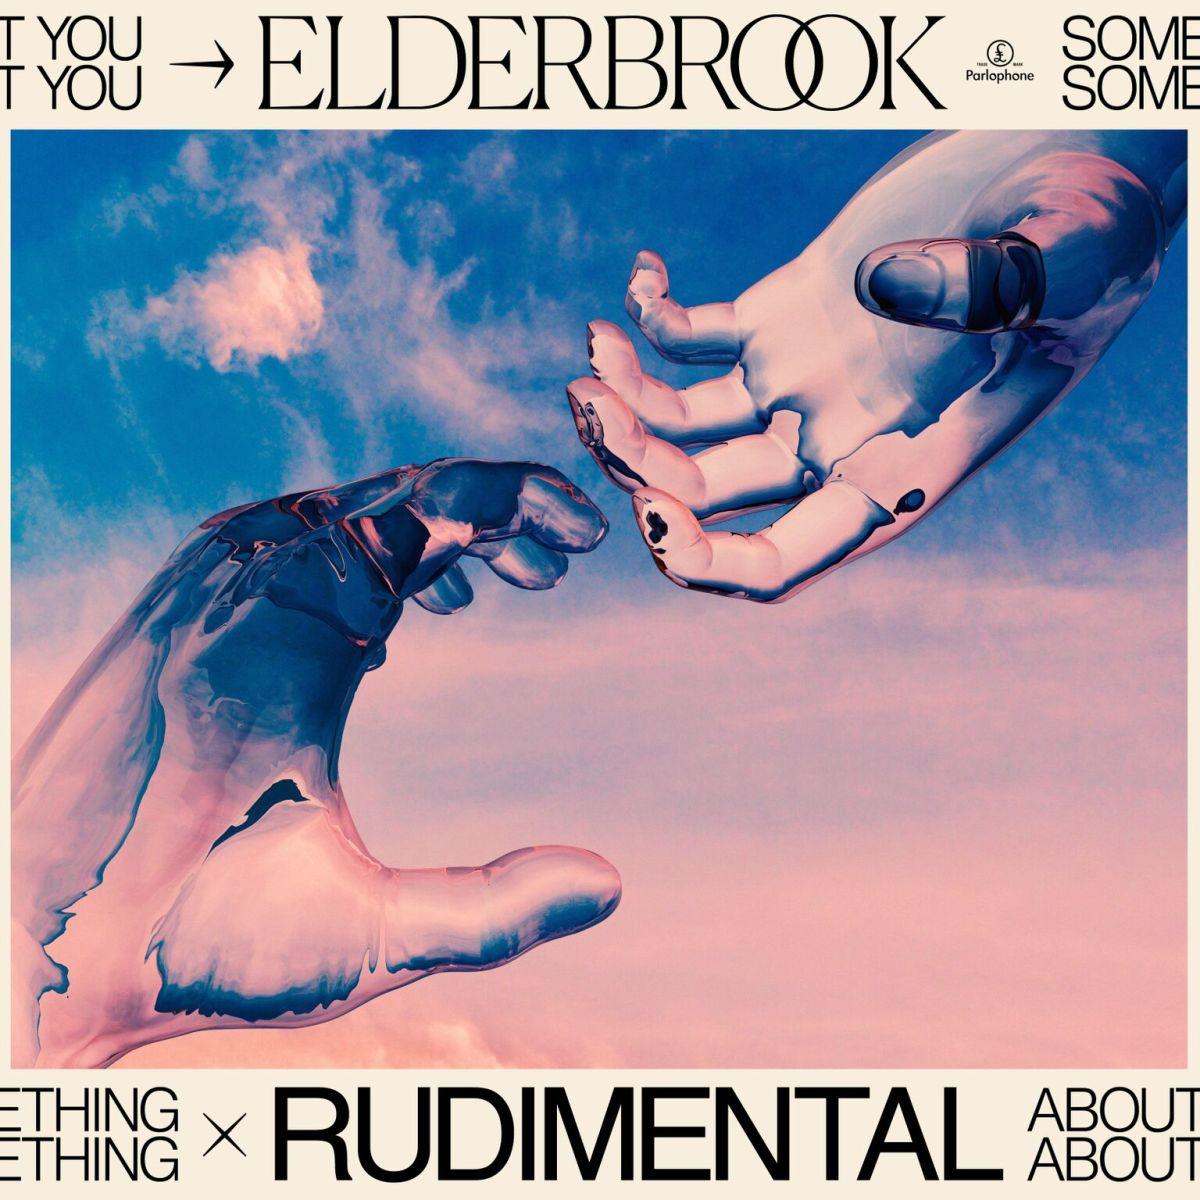 Something About You Elderbrook & Rudimental